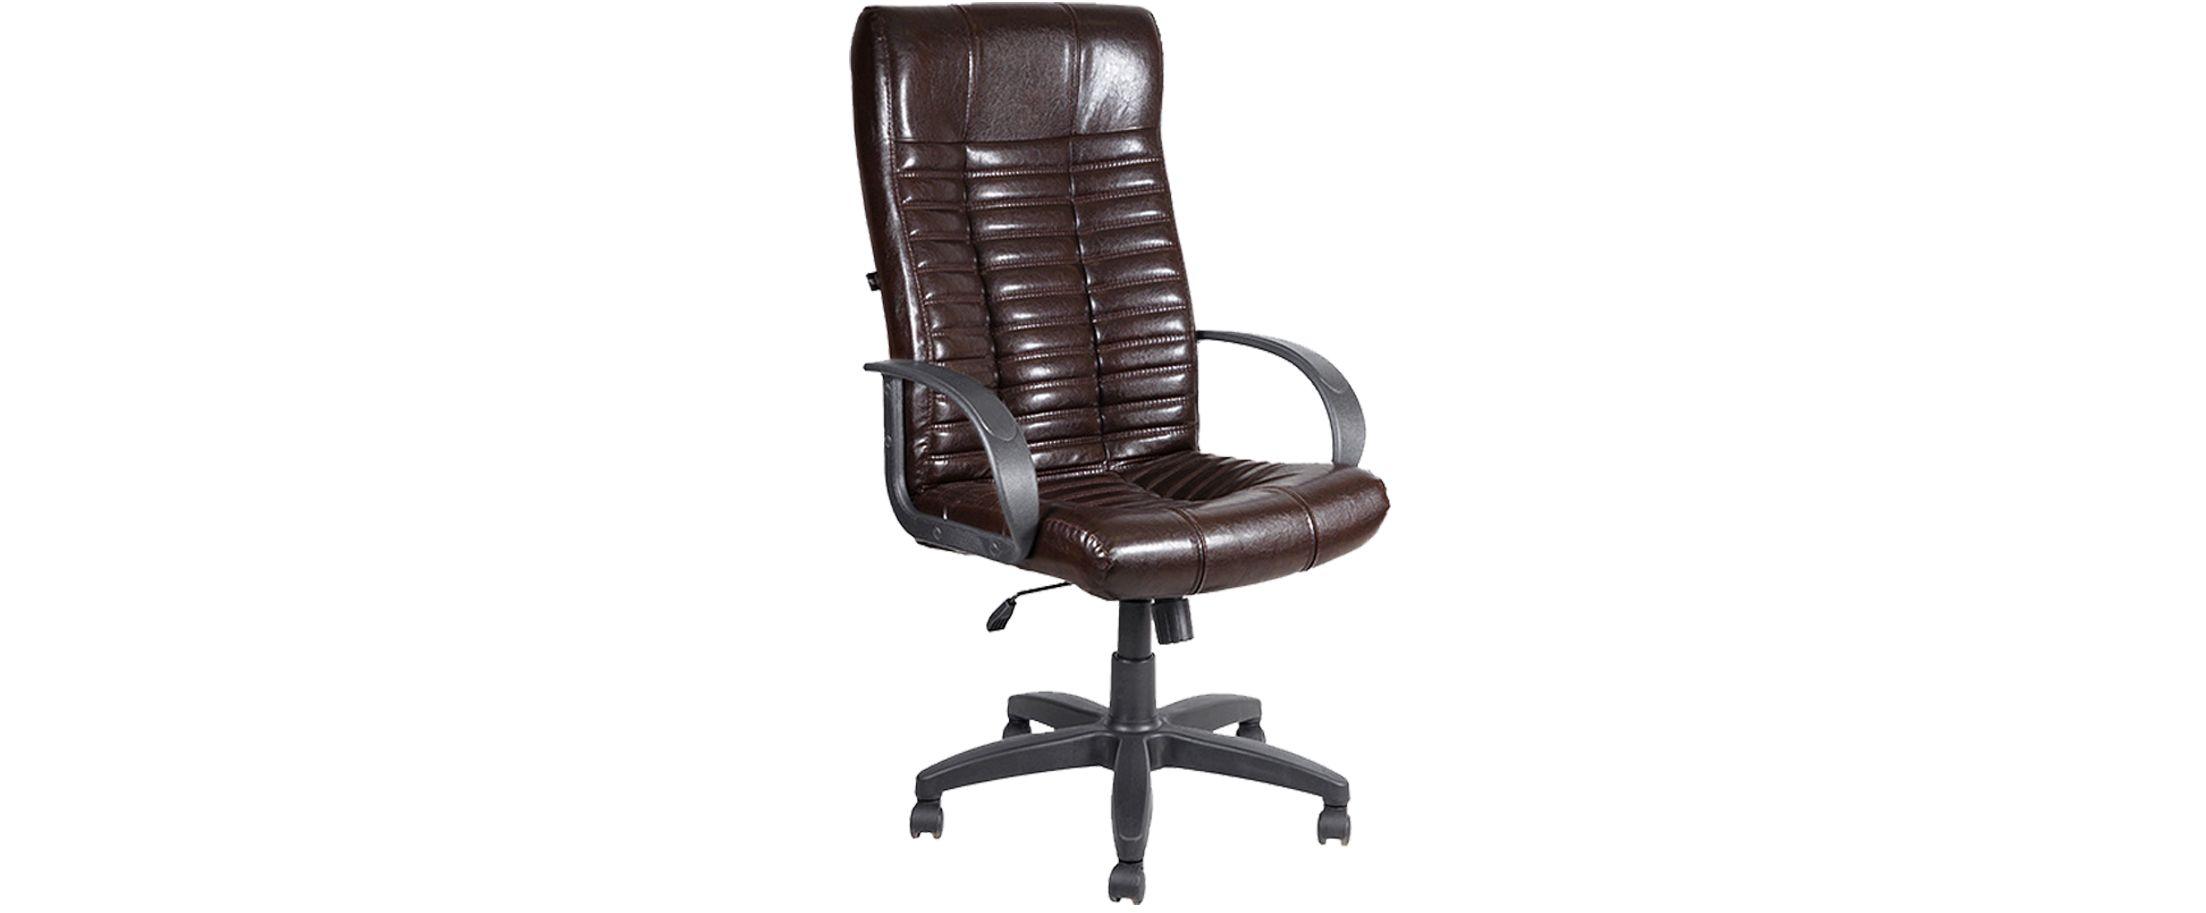 Кресло офисное AV 104 шоколад Модель 999Кресло офисное AV 104 шоколад Модель 999. Артикул Д000674<br>